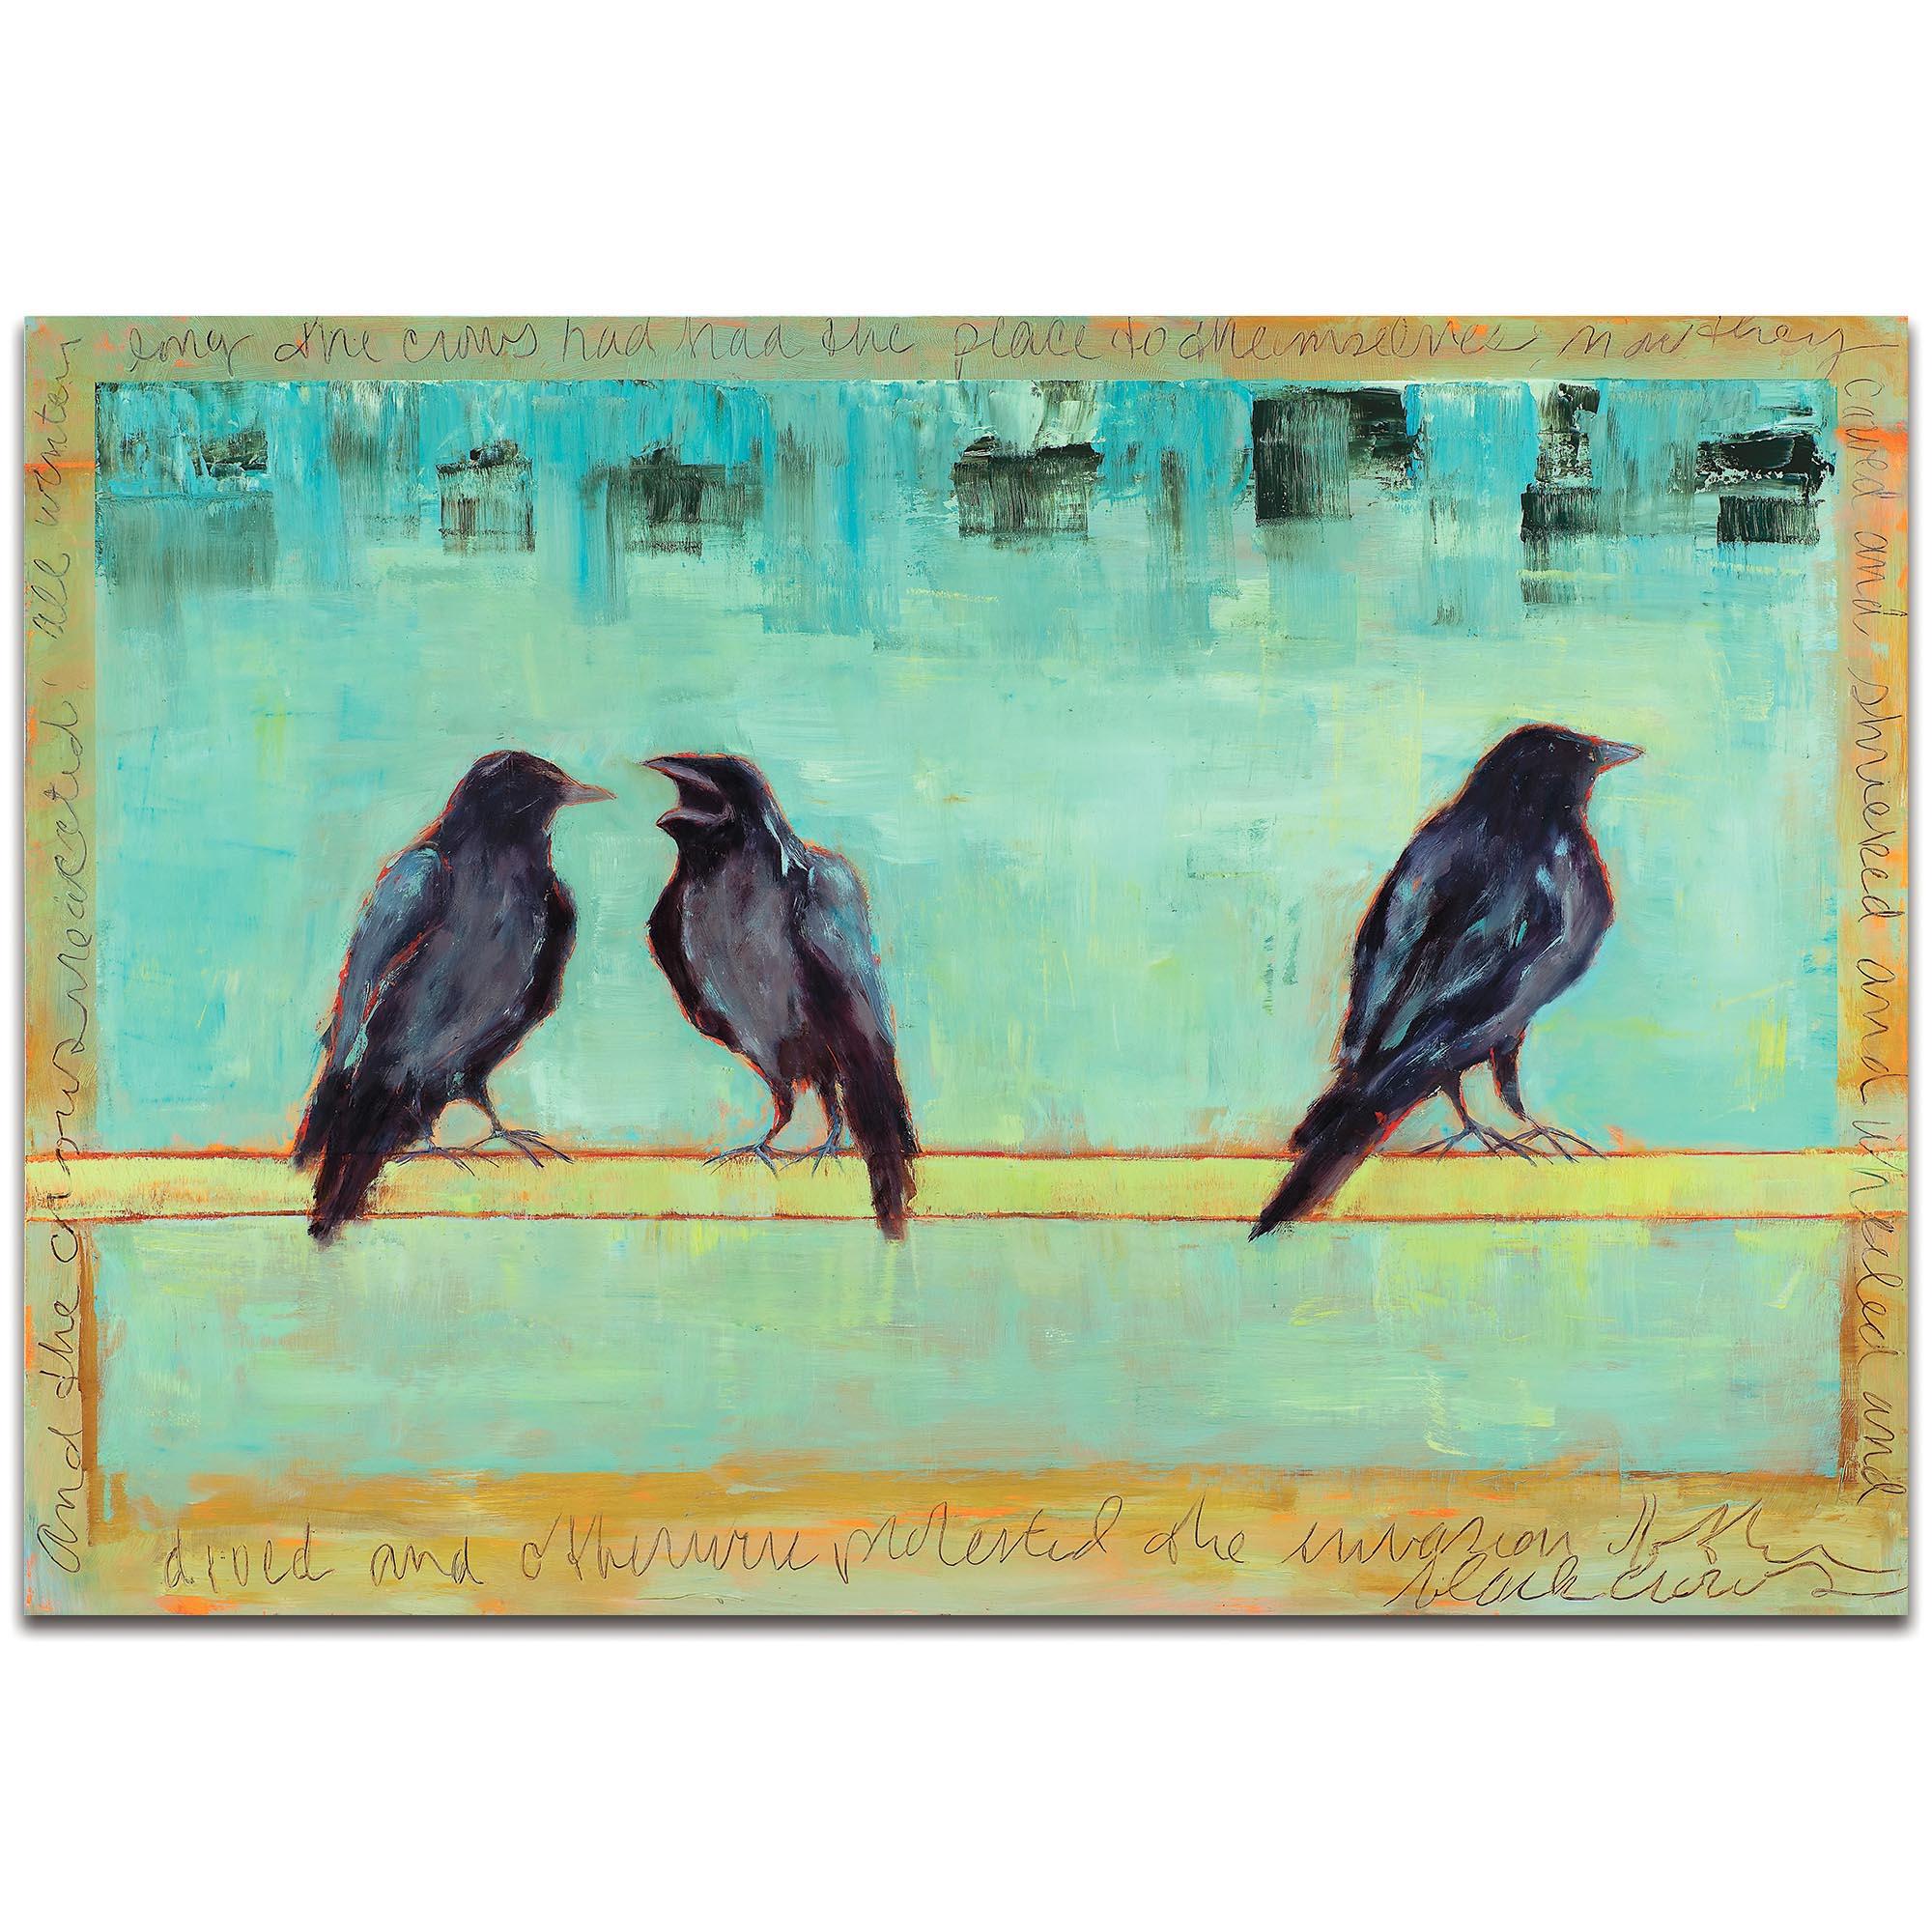 Contemporary Wall Art 'Crow Bar 2' - Urban Birds Decor on Metal or Plexiglass